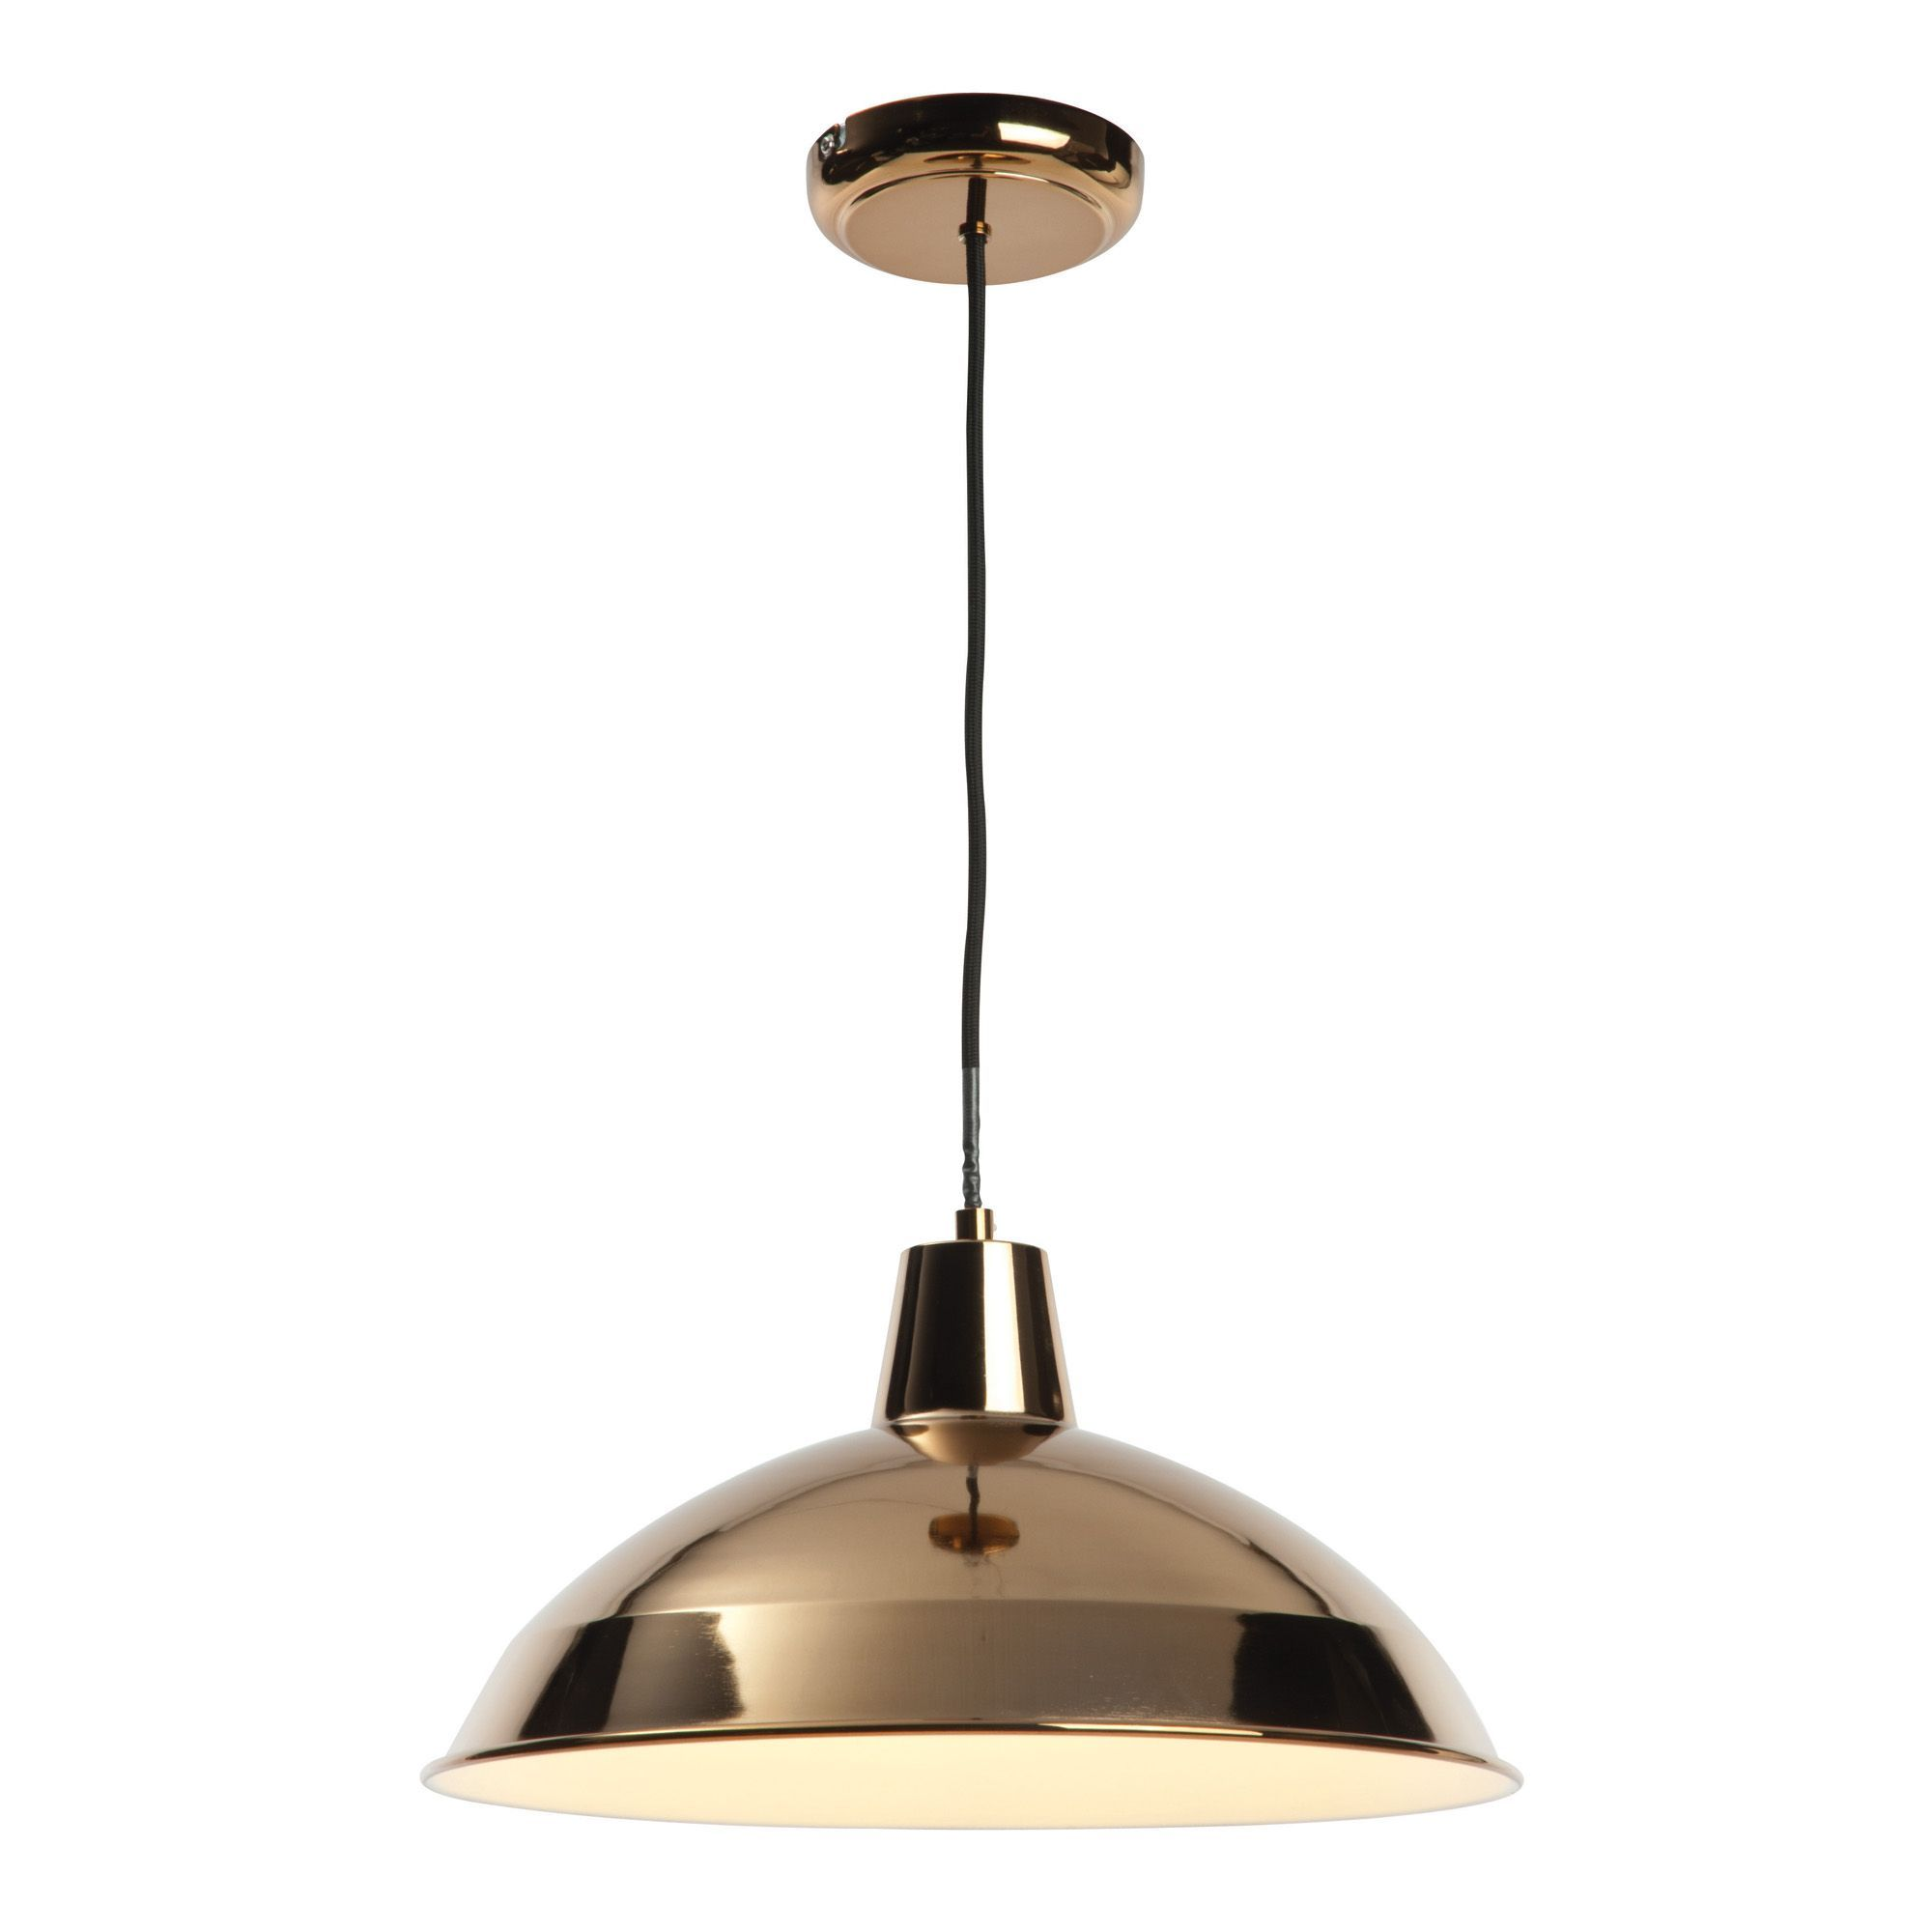 Manison Dome Copper Pendant Ceiling Light | Pinterest